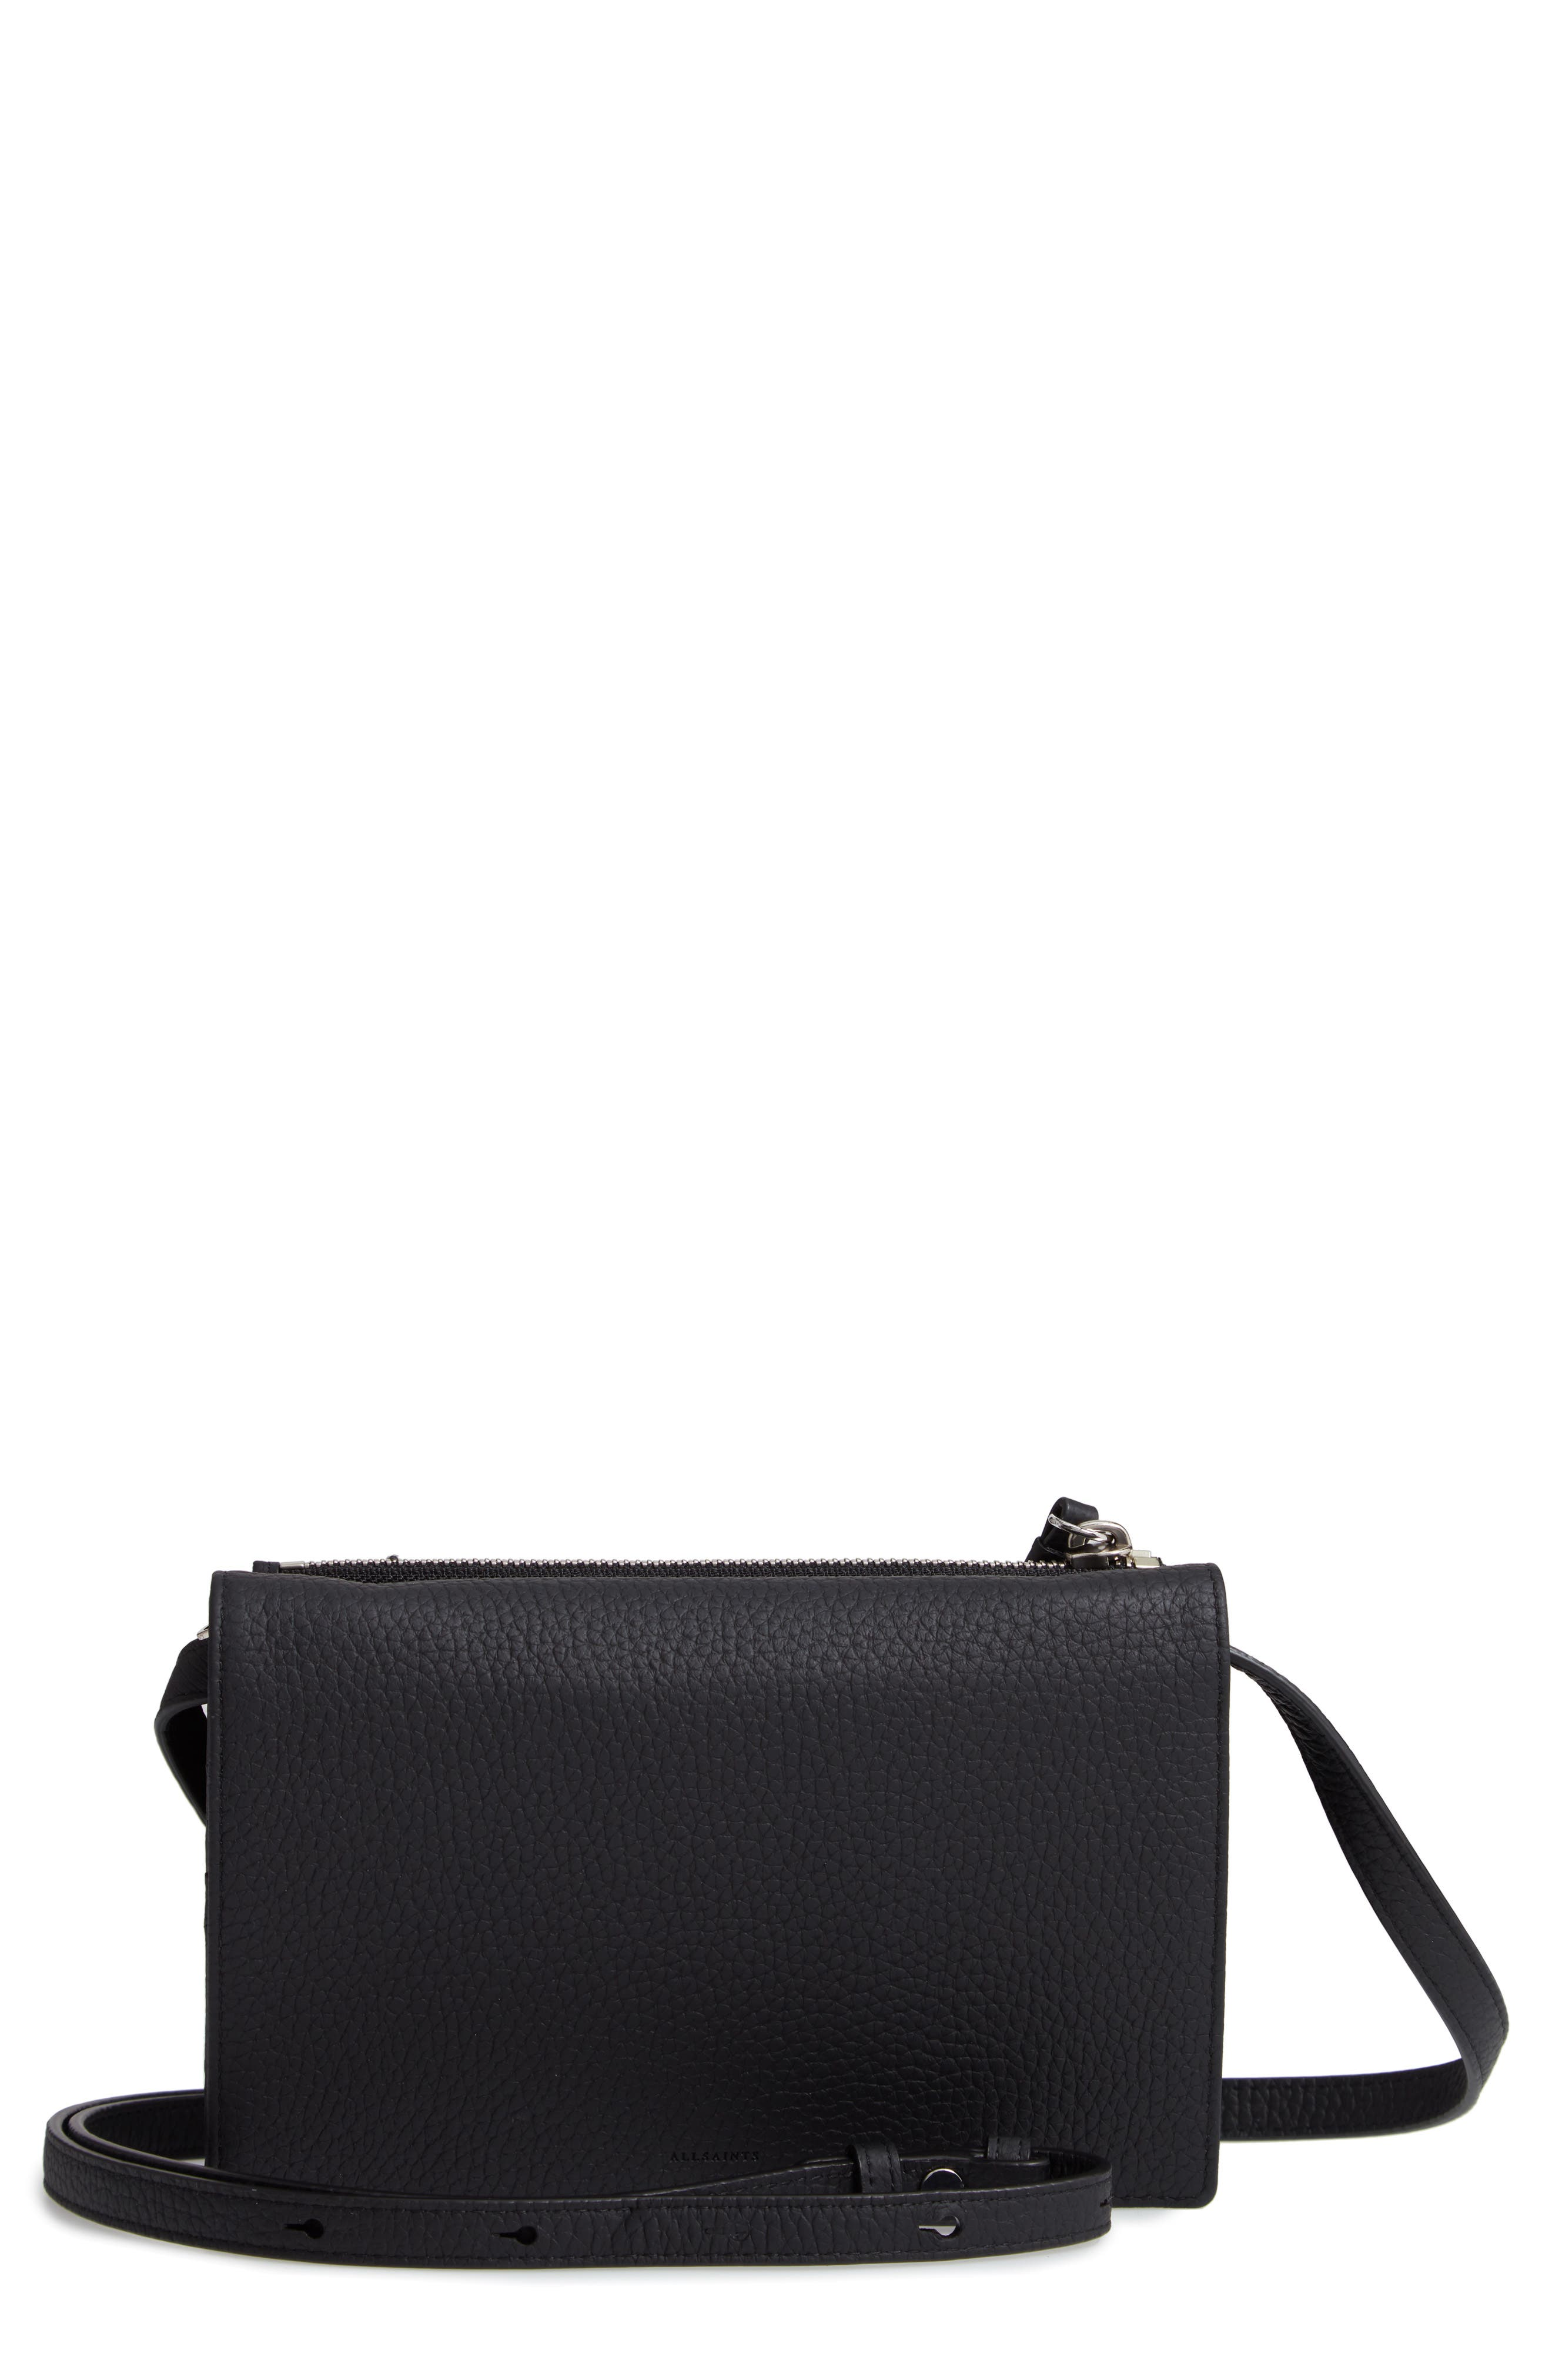 44e1d70373 ALLSAINTS Handbags   Wallets for Women